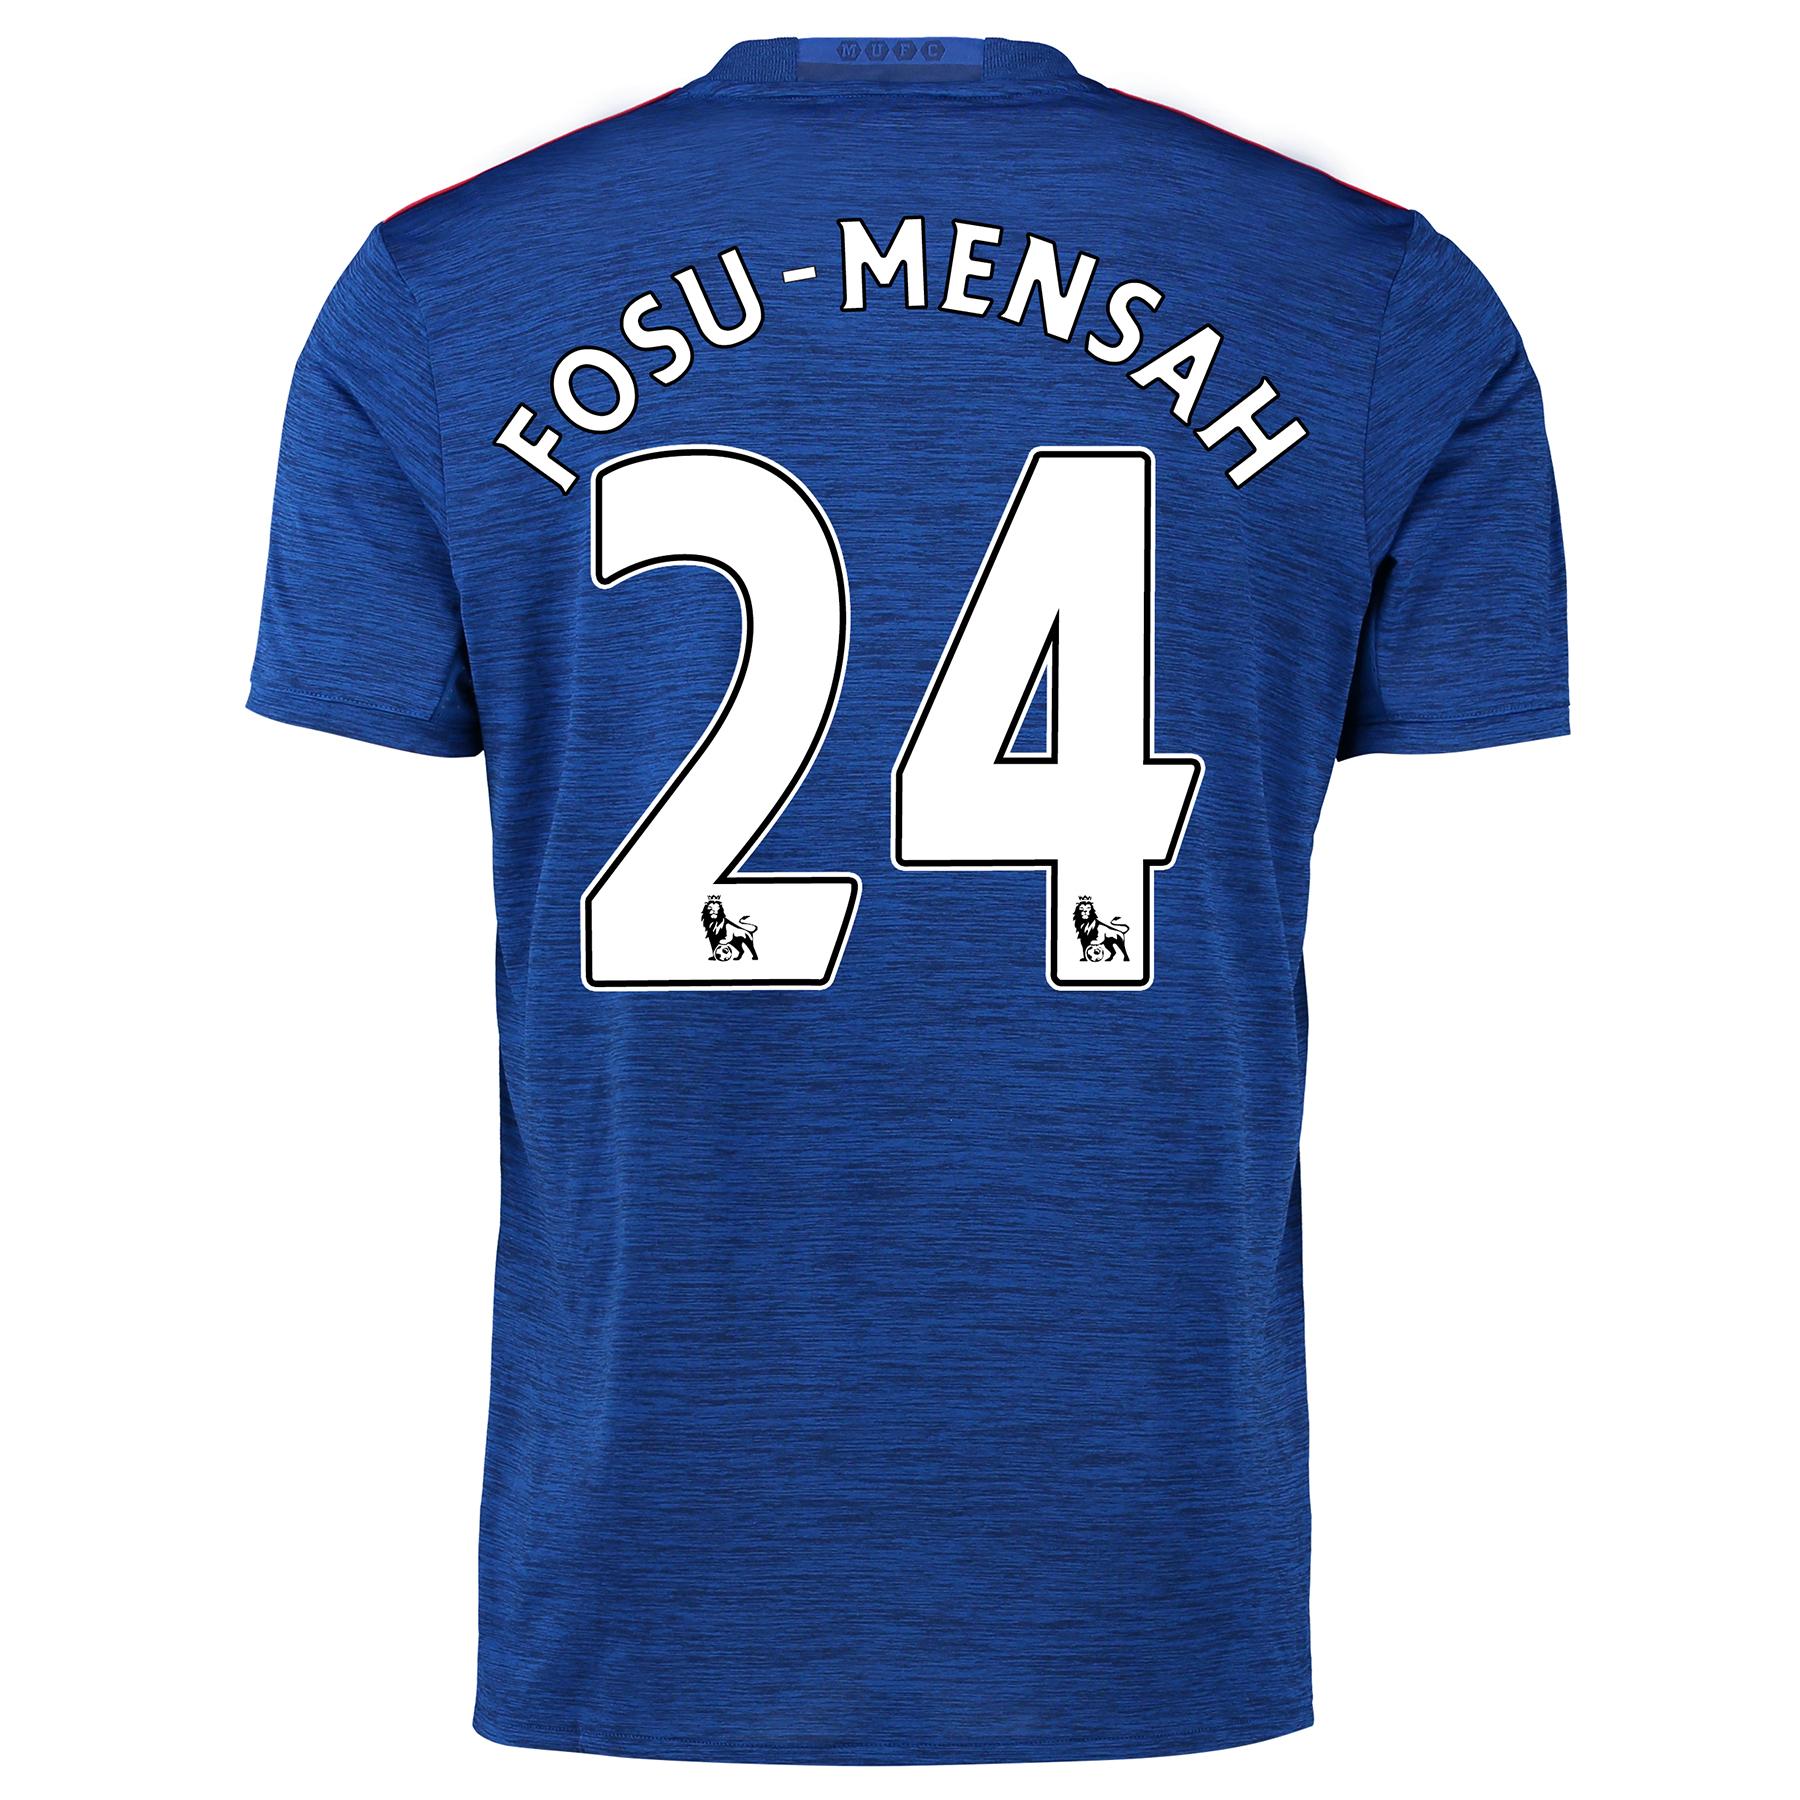 Manchester United Away Shirt 2016-17 with Fosu-Mensah 24 printing